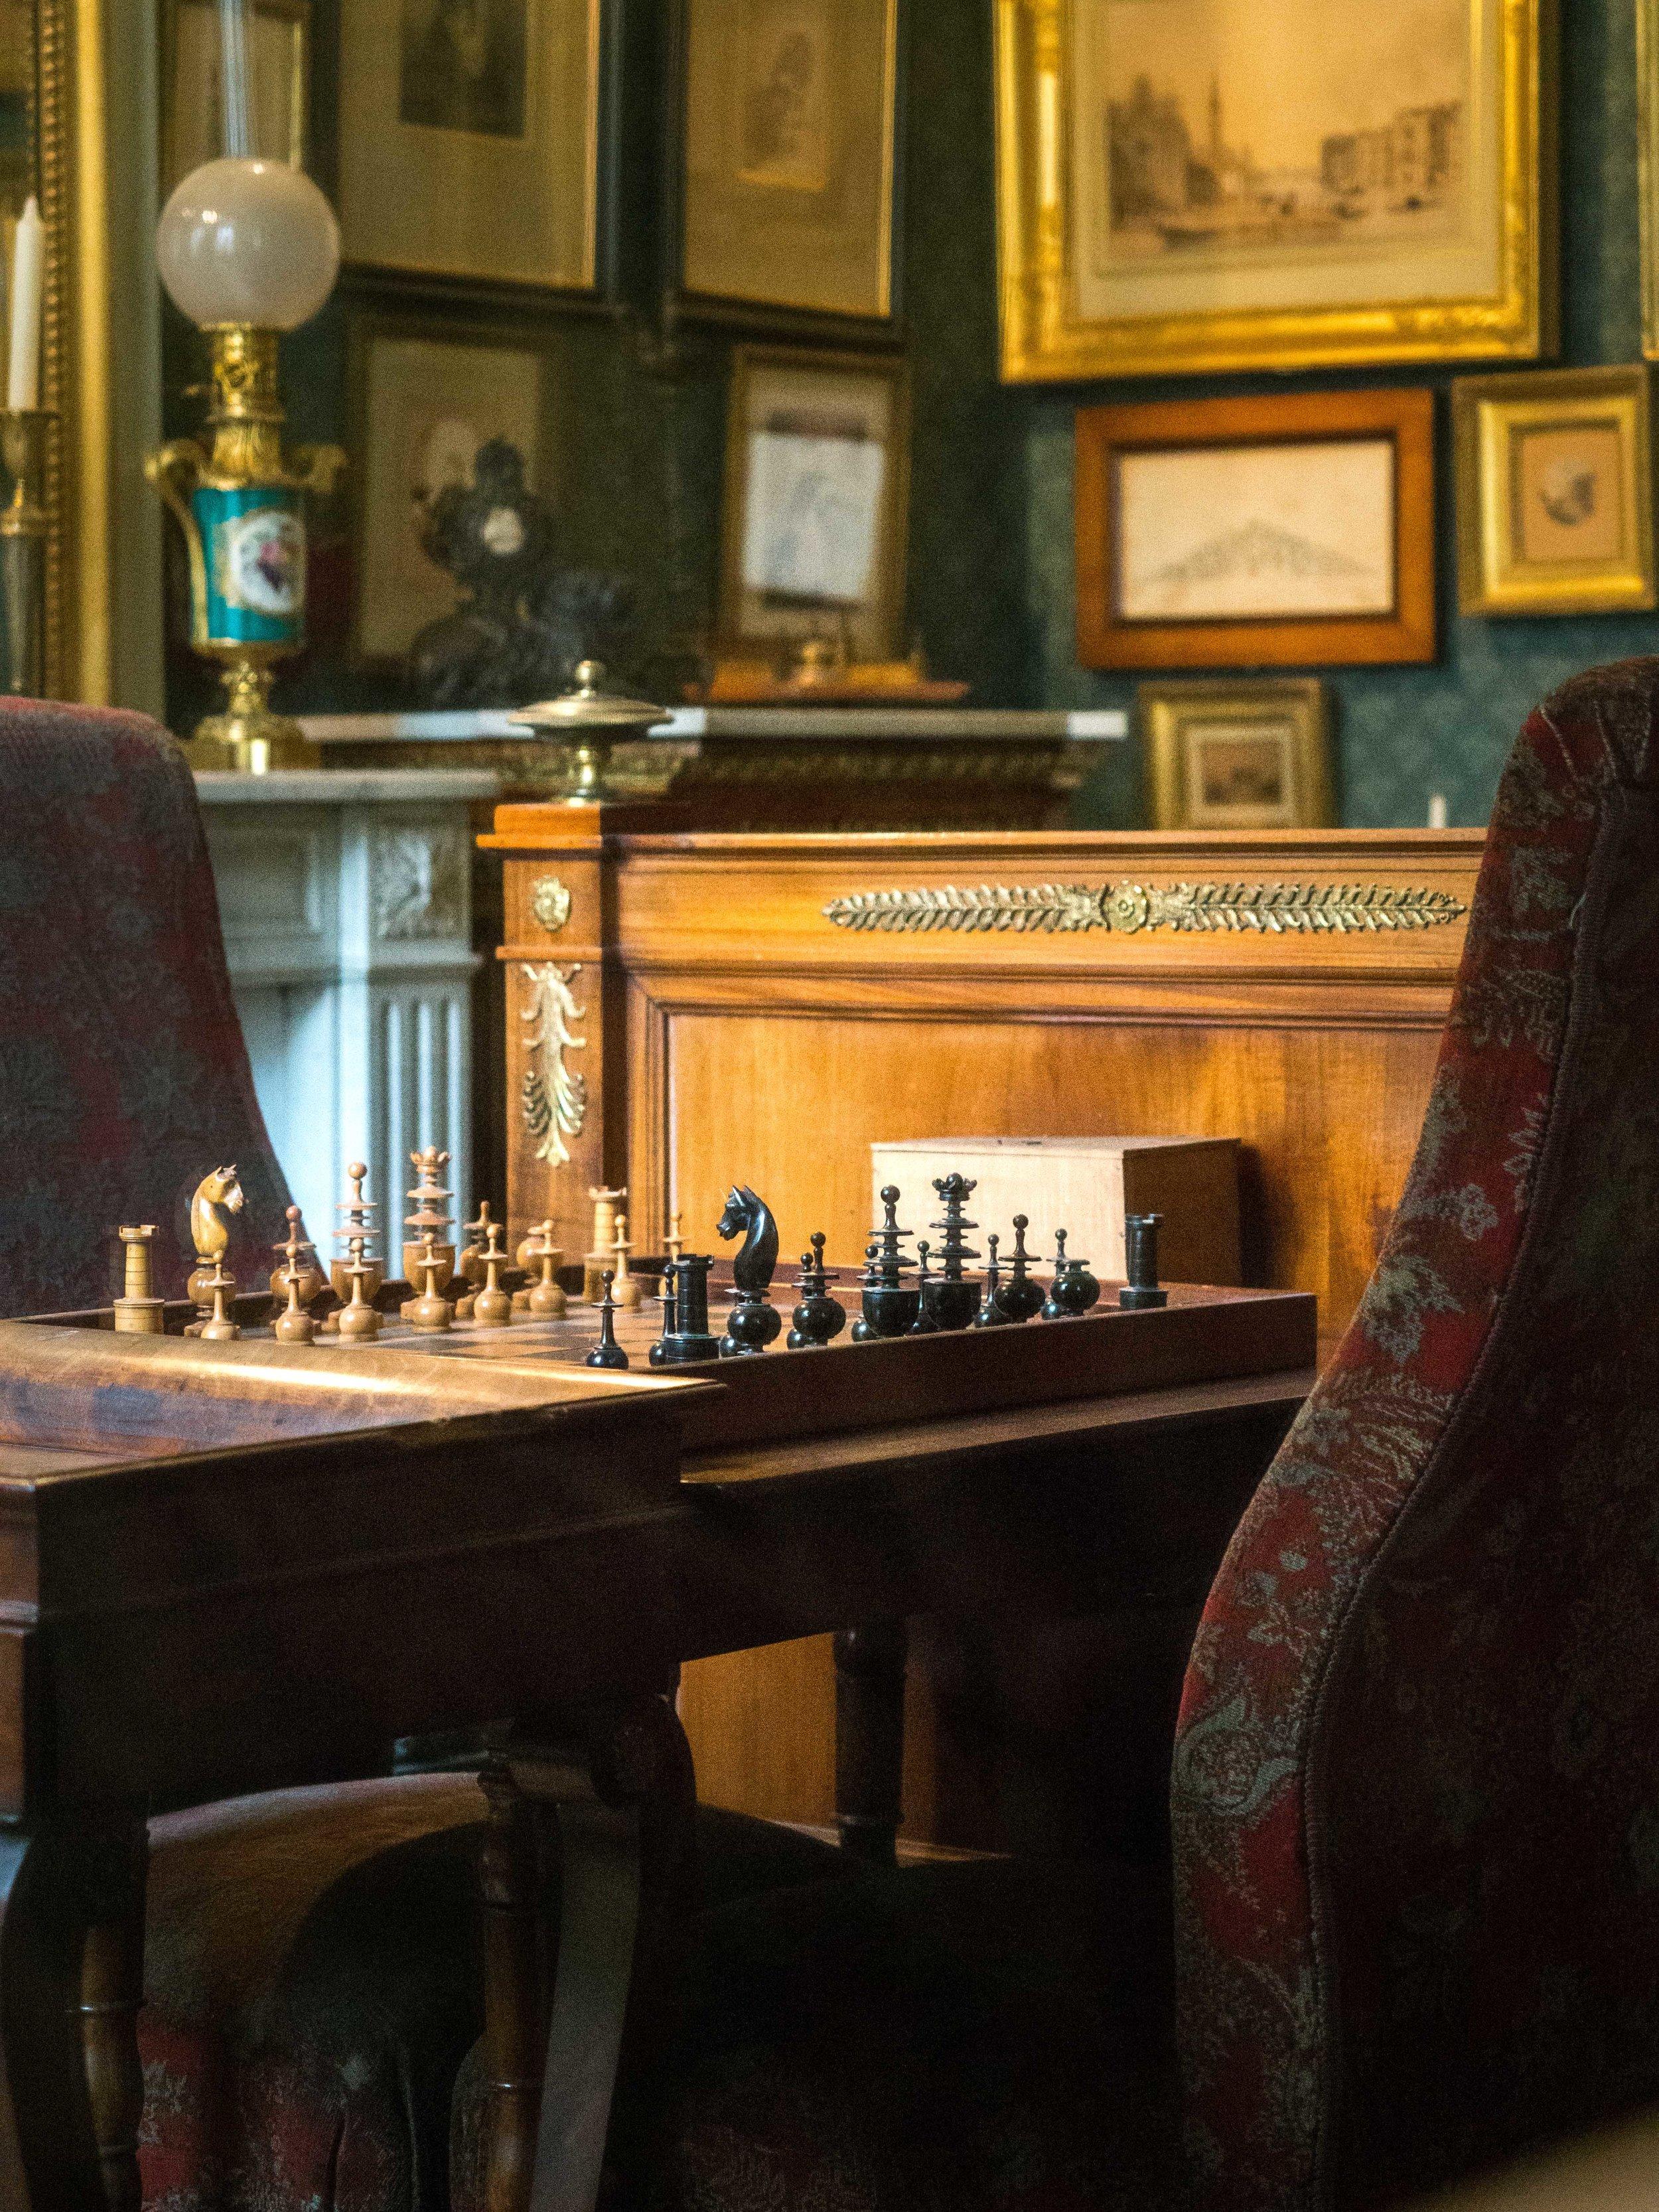 Gustave Moreau: Chess Set